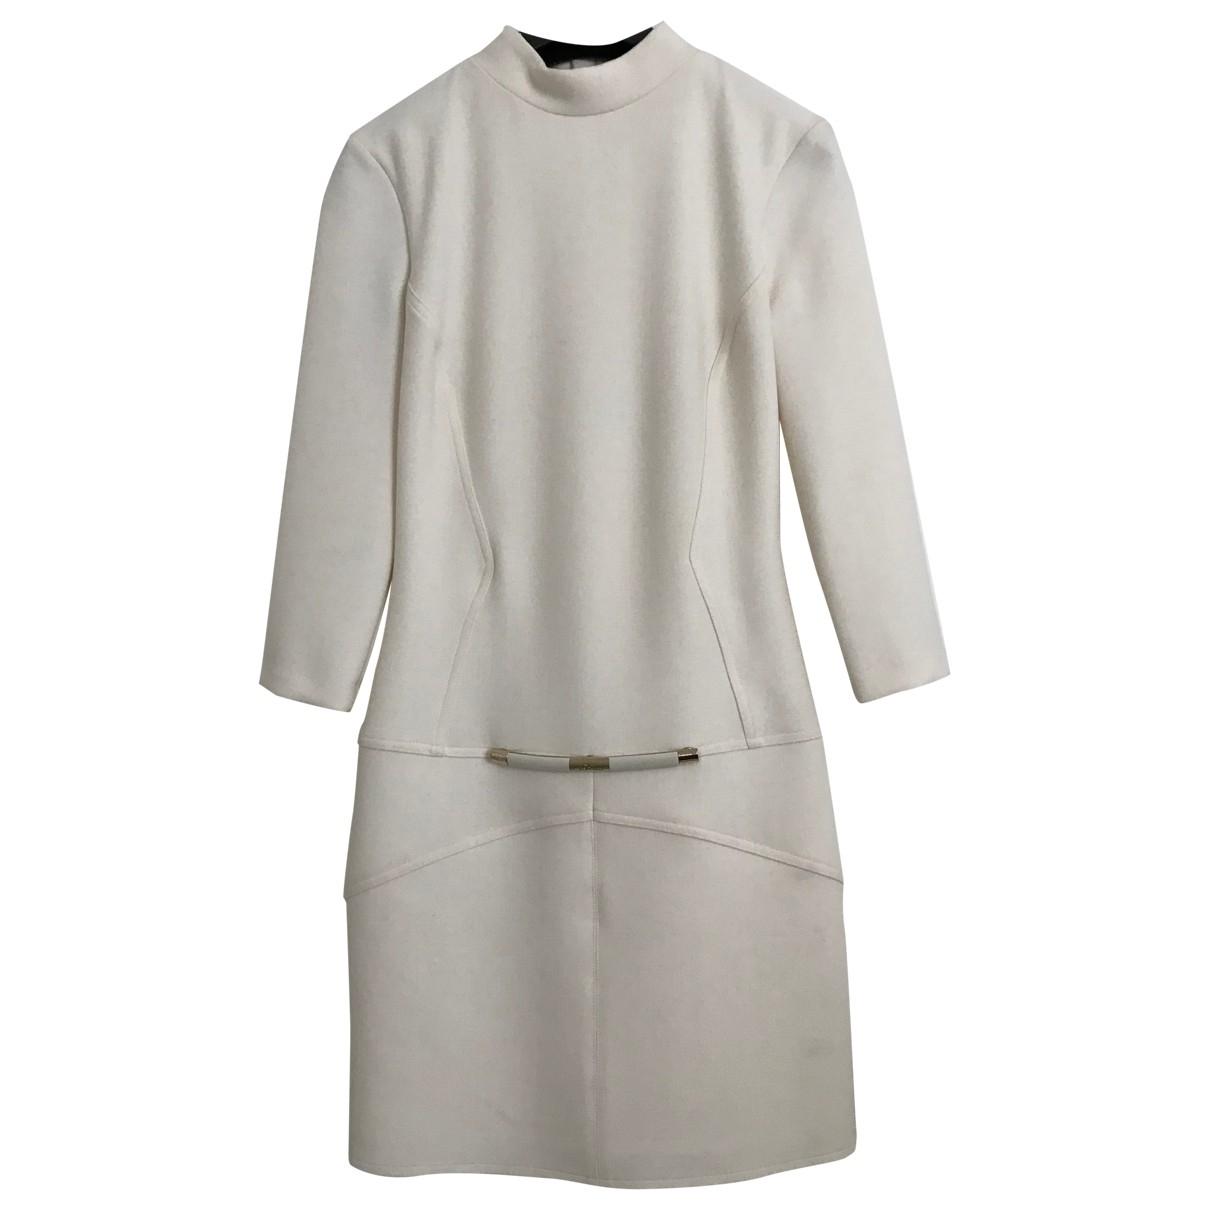 Elisabetta Franchi \N White dress for Women 38 IT